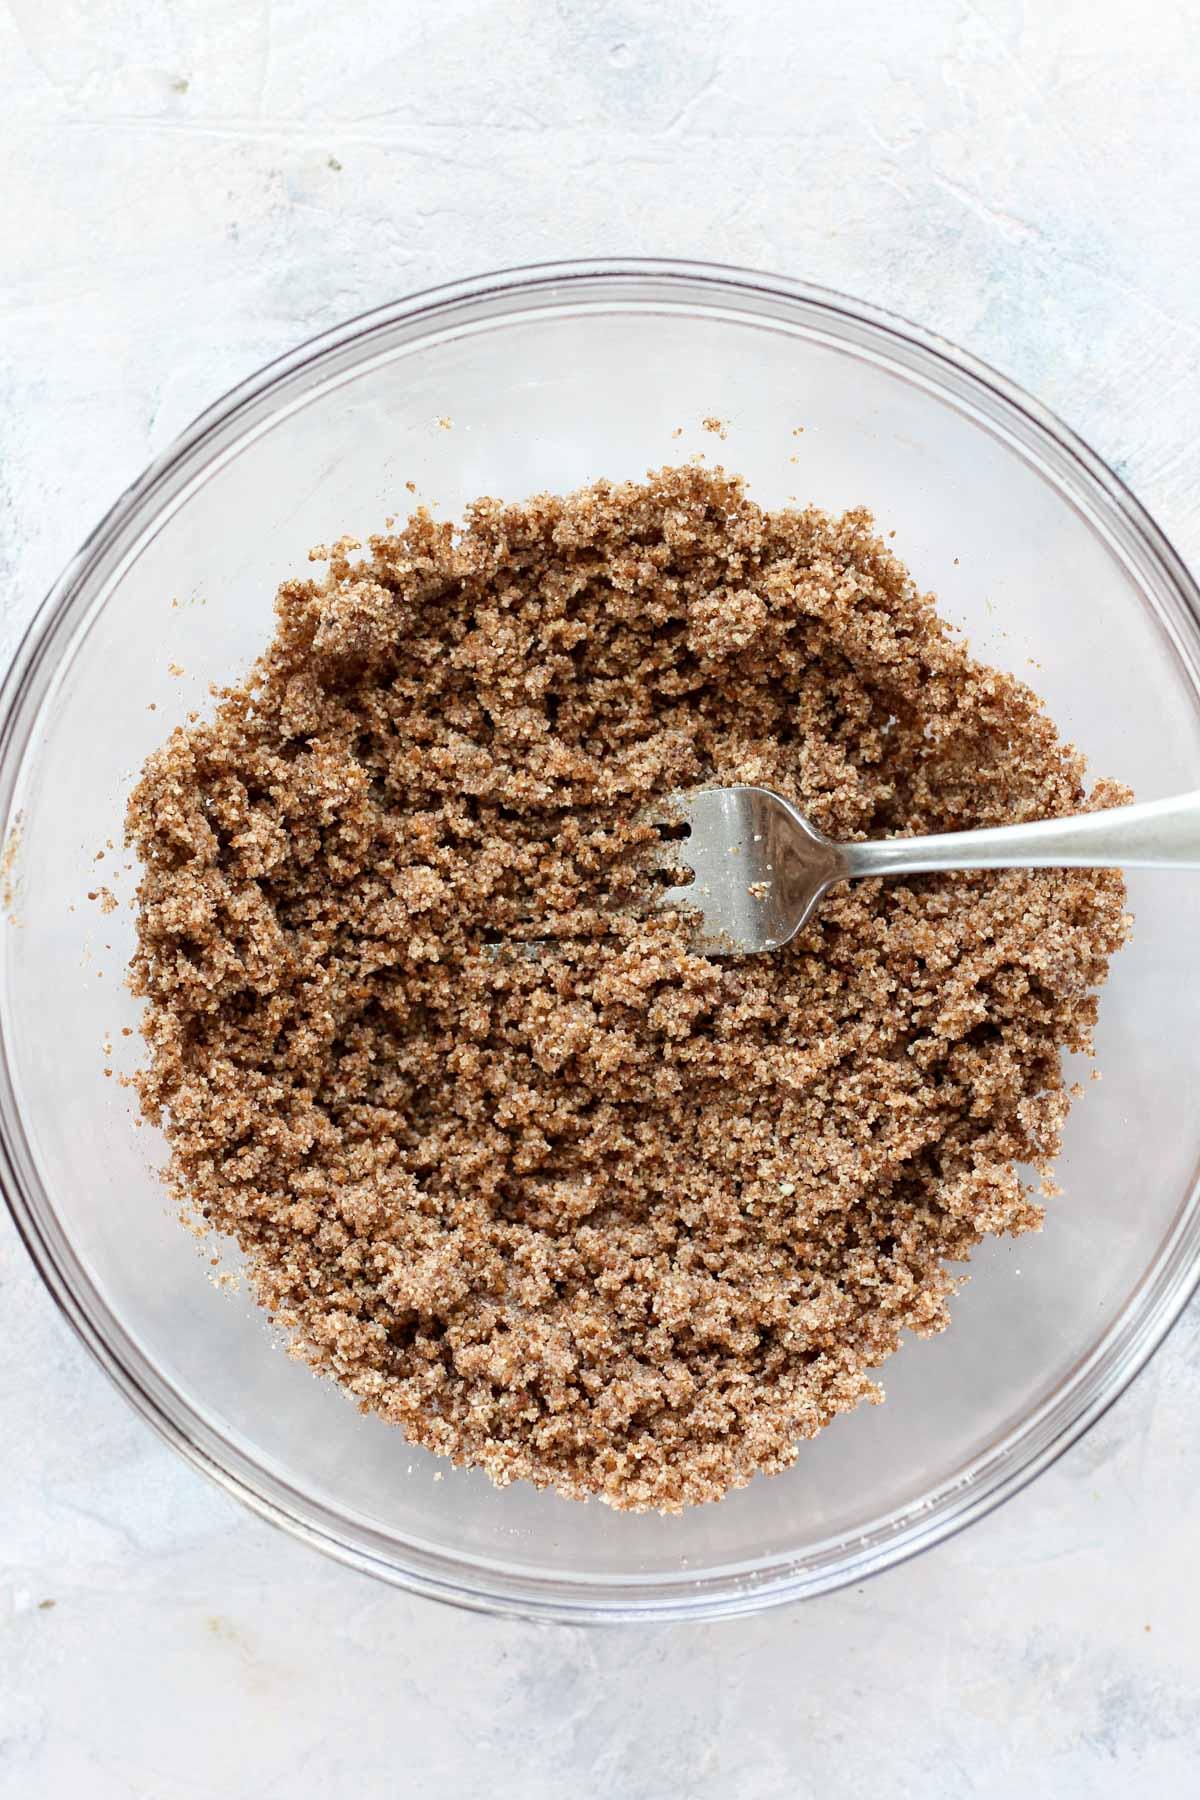 Bowl of cinnamon sugar crumble topping.